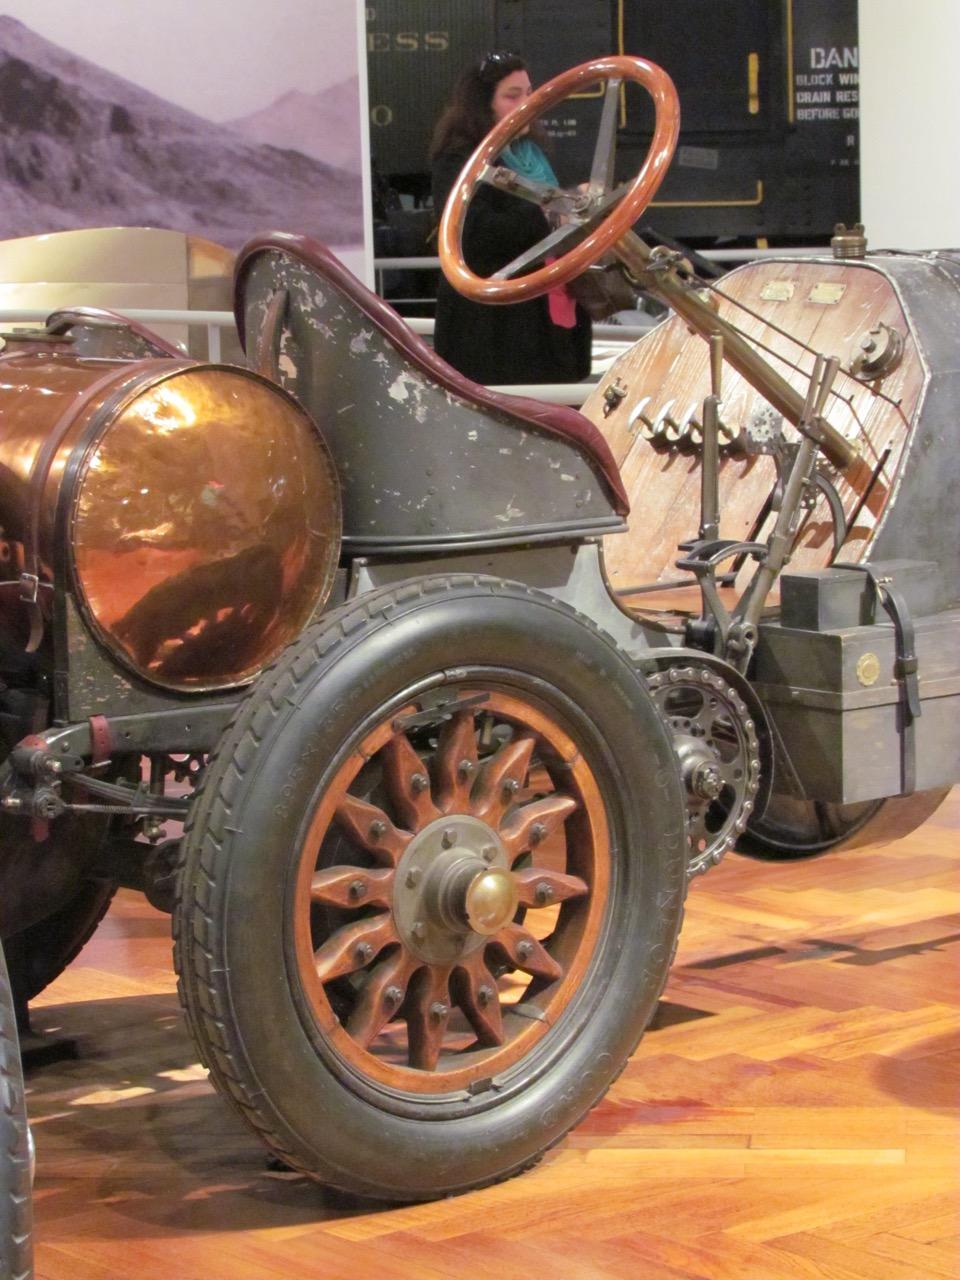 ClassicCars.com Journal